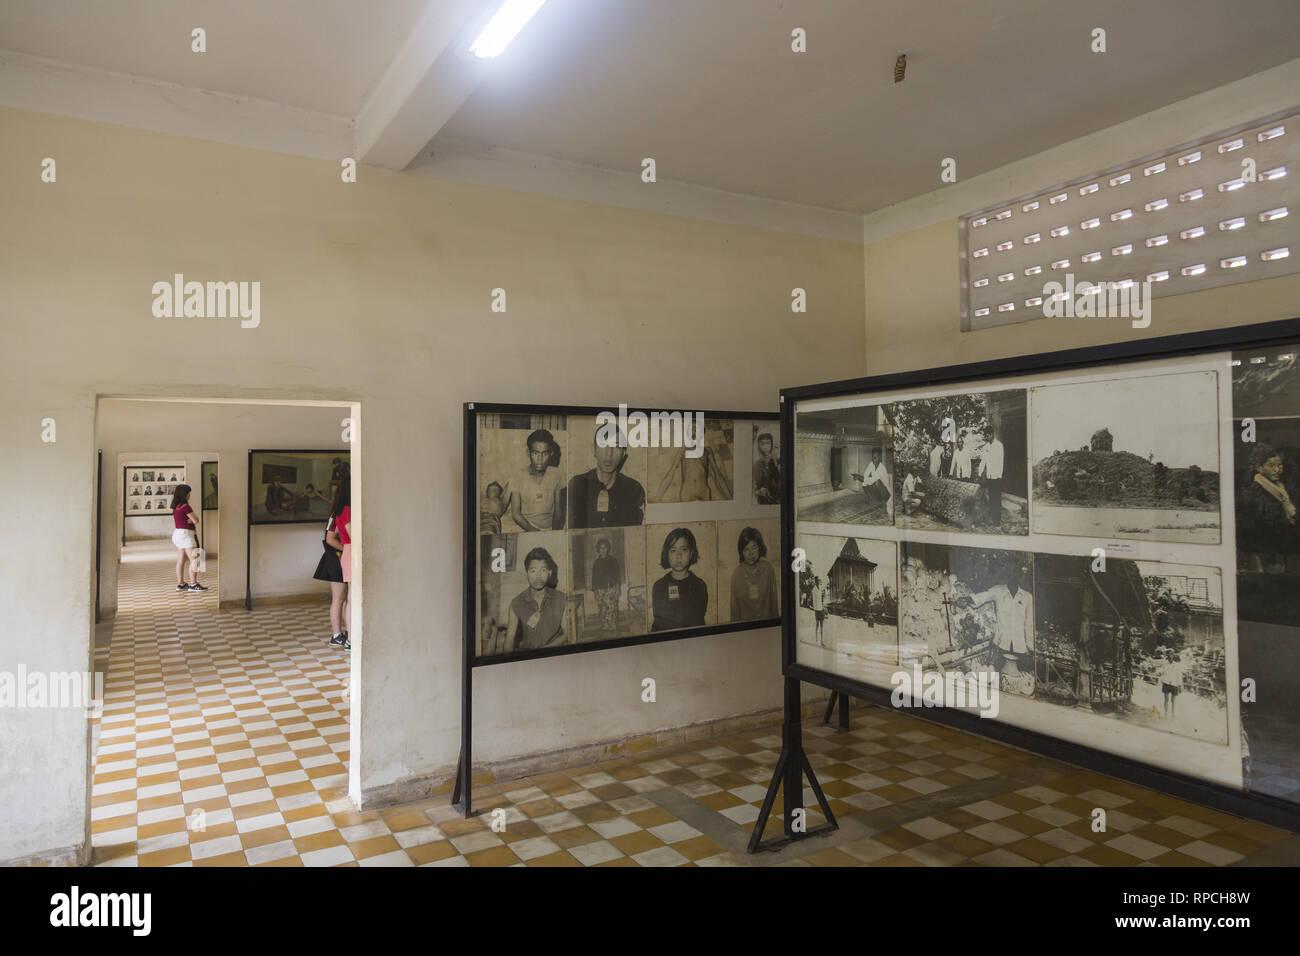 Red Khmer prison in Phnom Penh - Stock Image